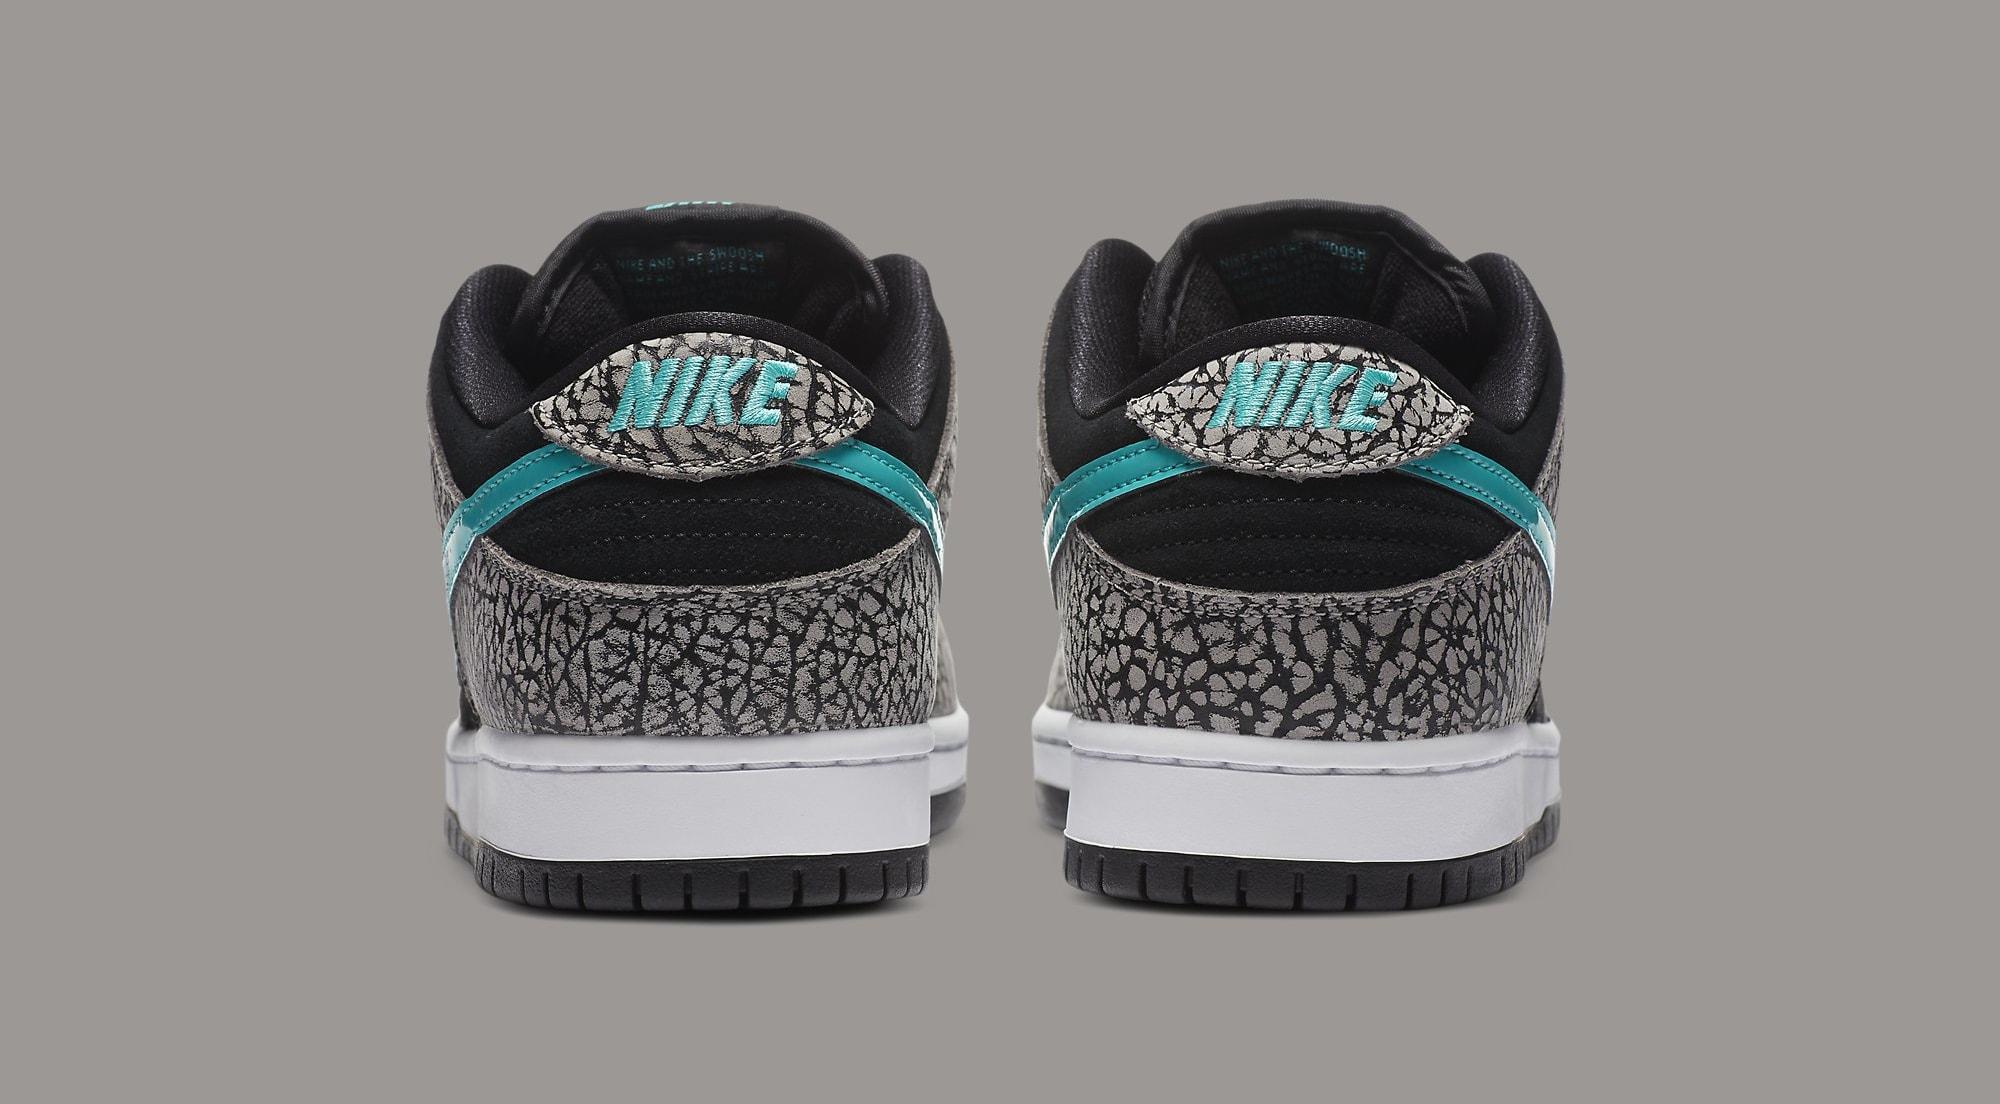 Nike SB Dunk Low 'Atmos Elephant' BQ6817-009 Heel